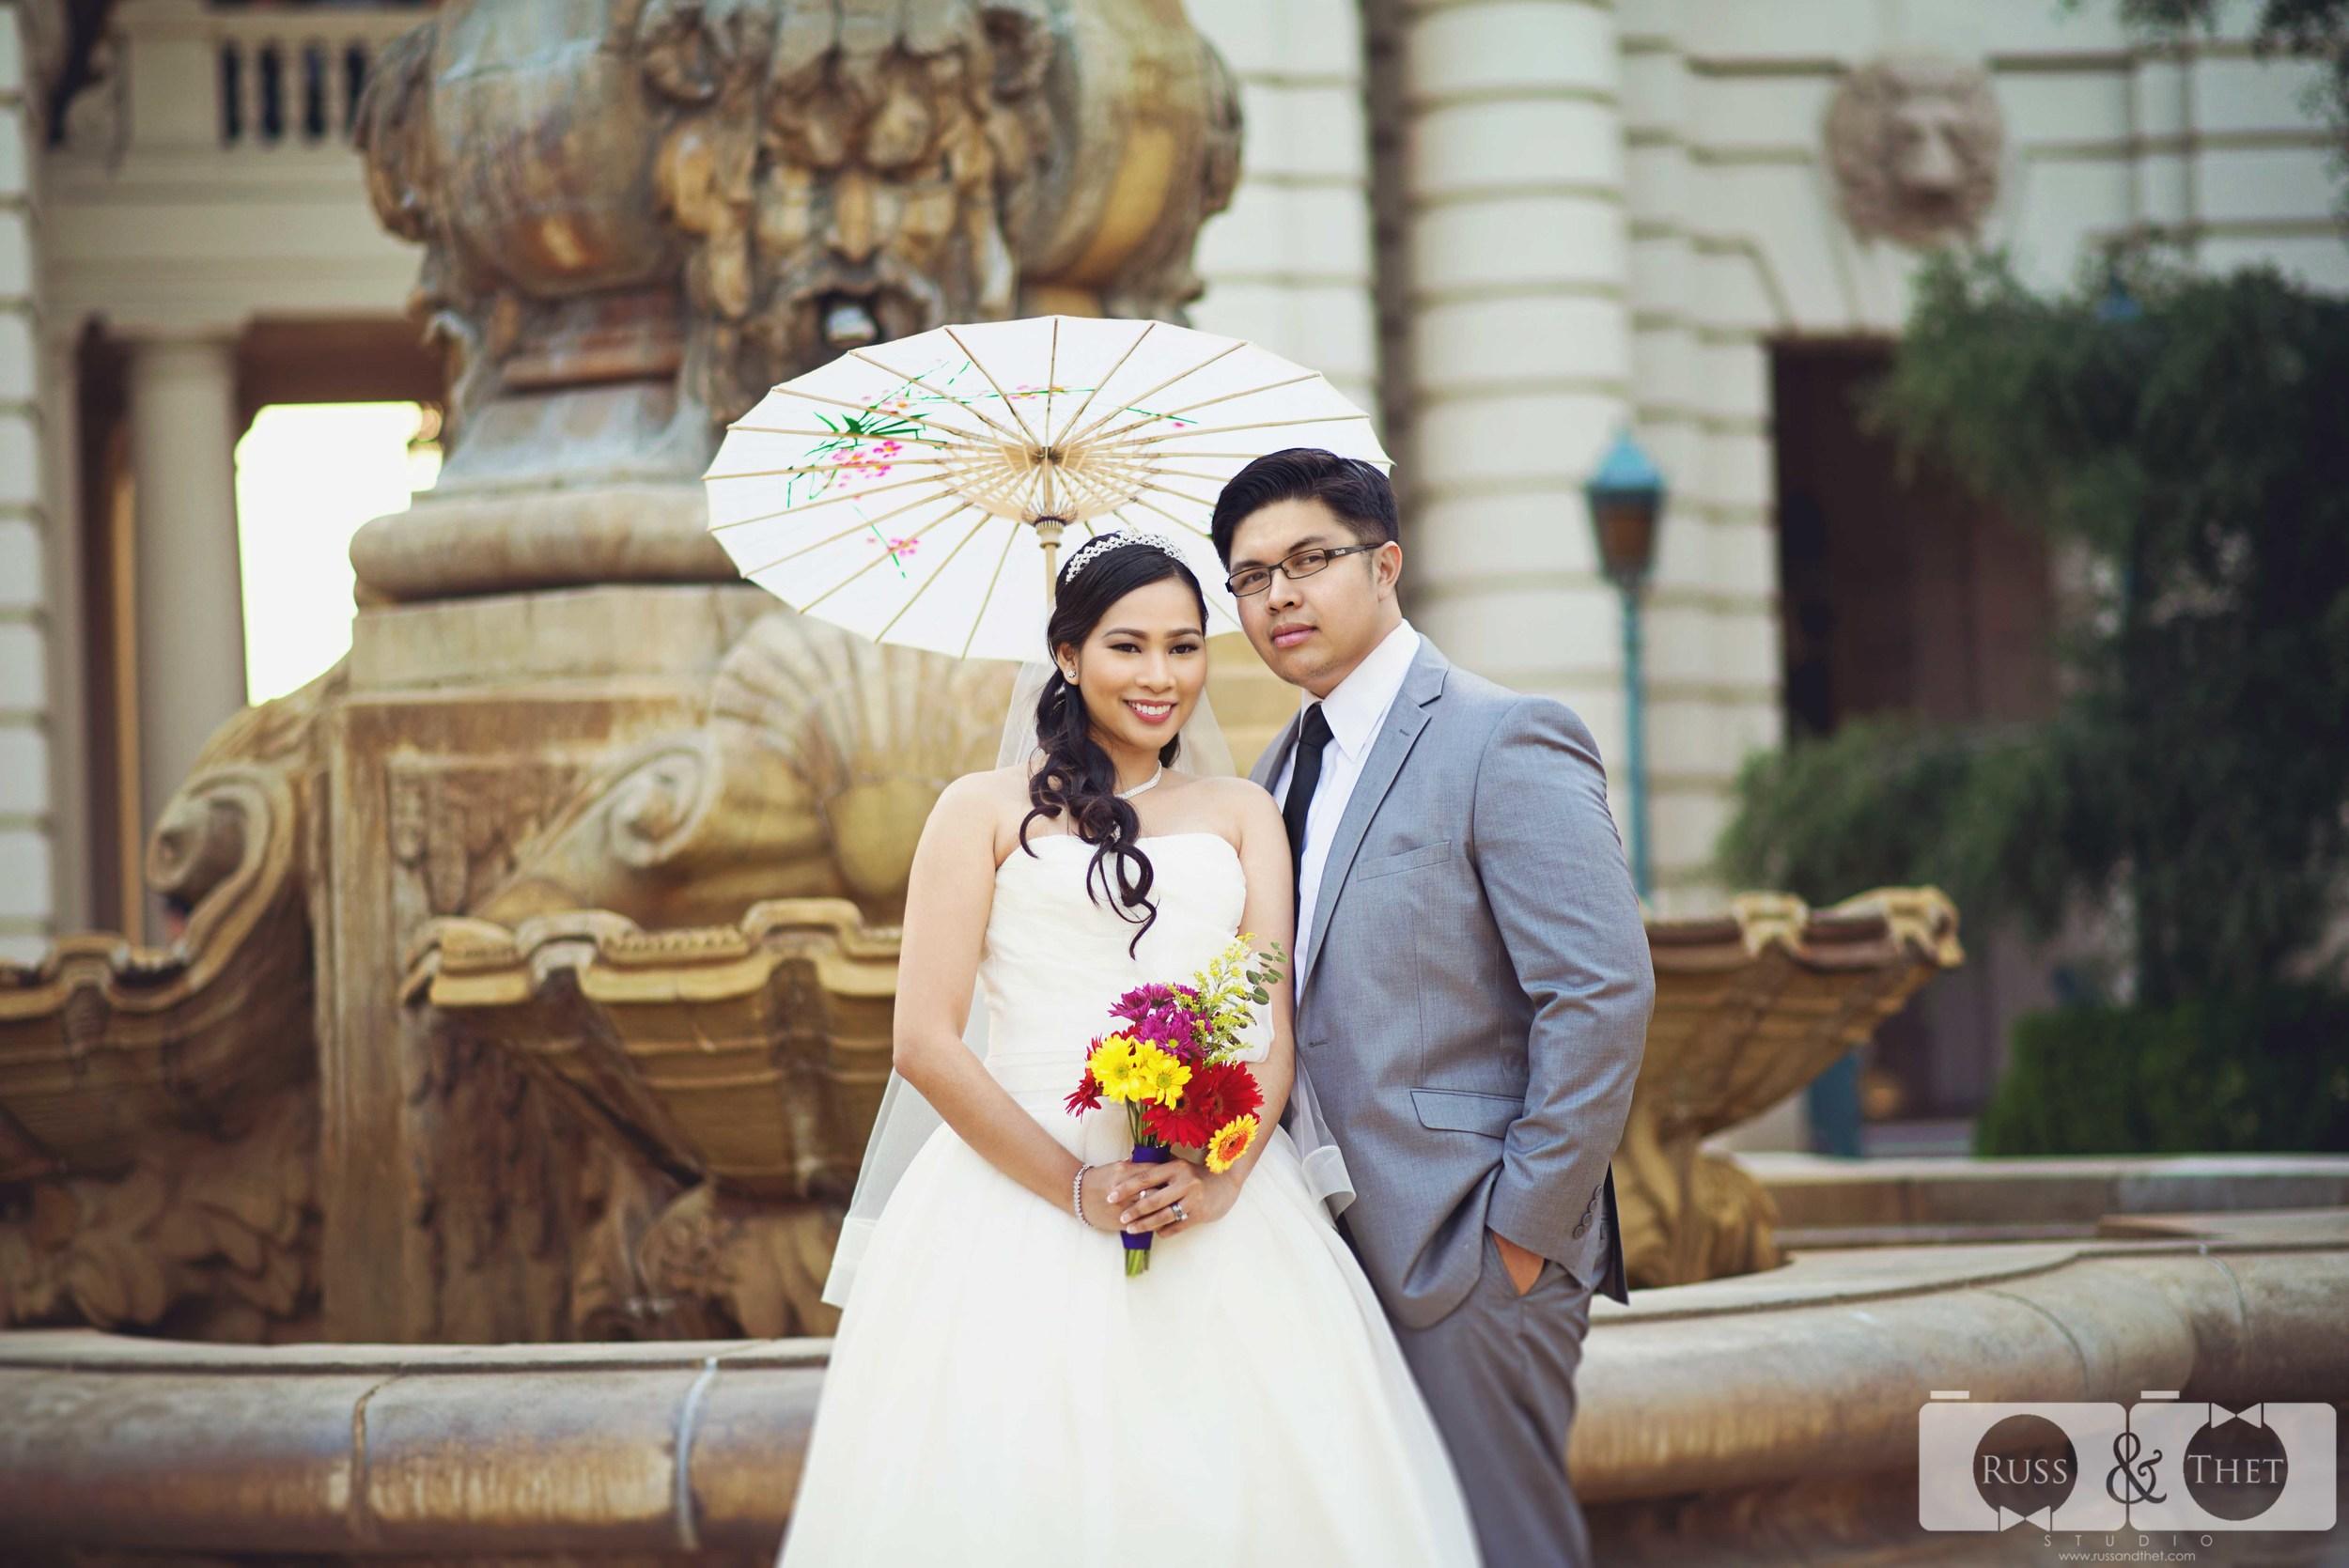 royal-palace-banquet-hall-glendale-wedding-10.JPG